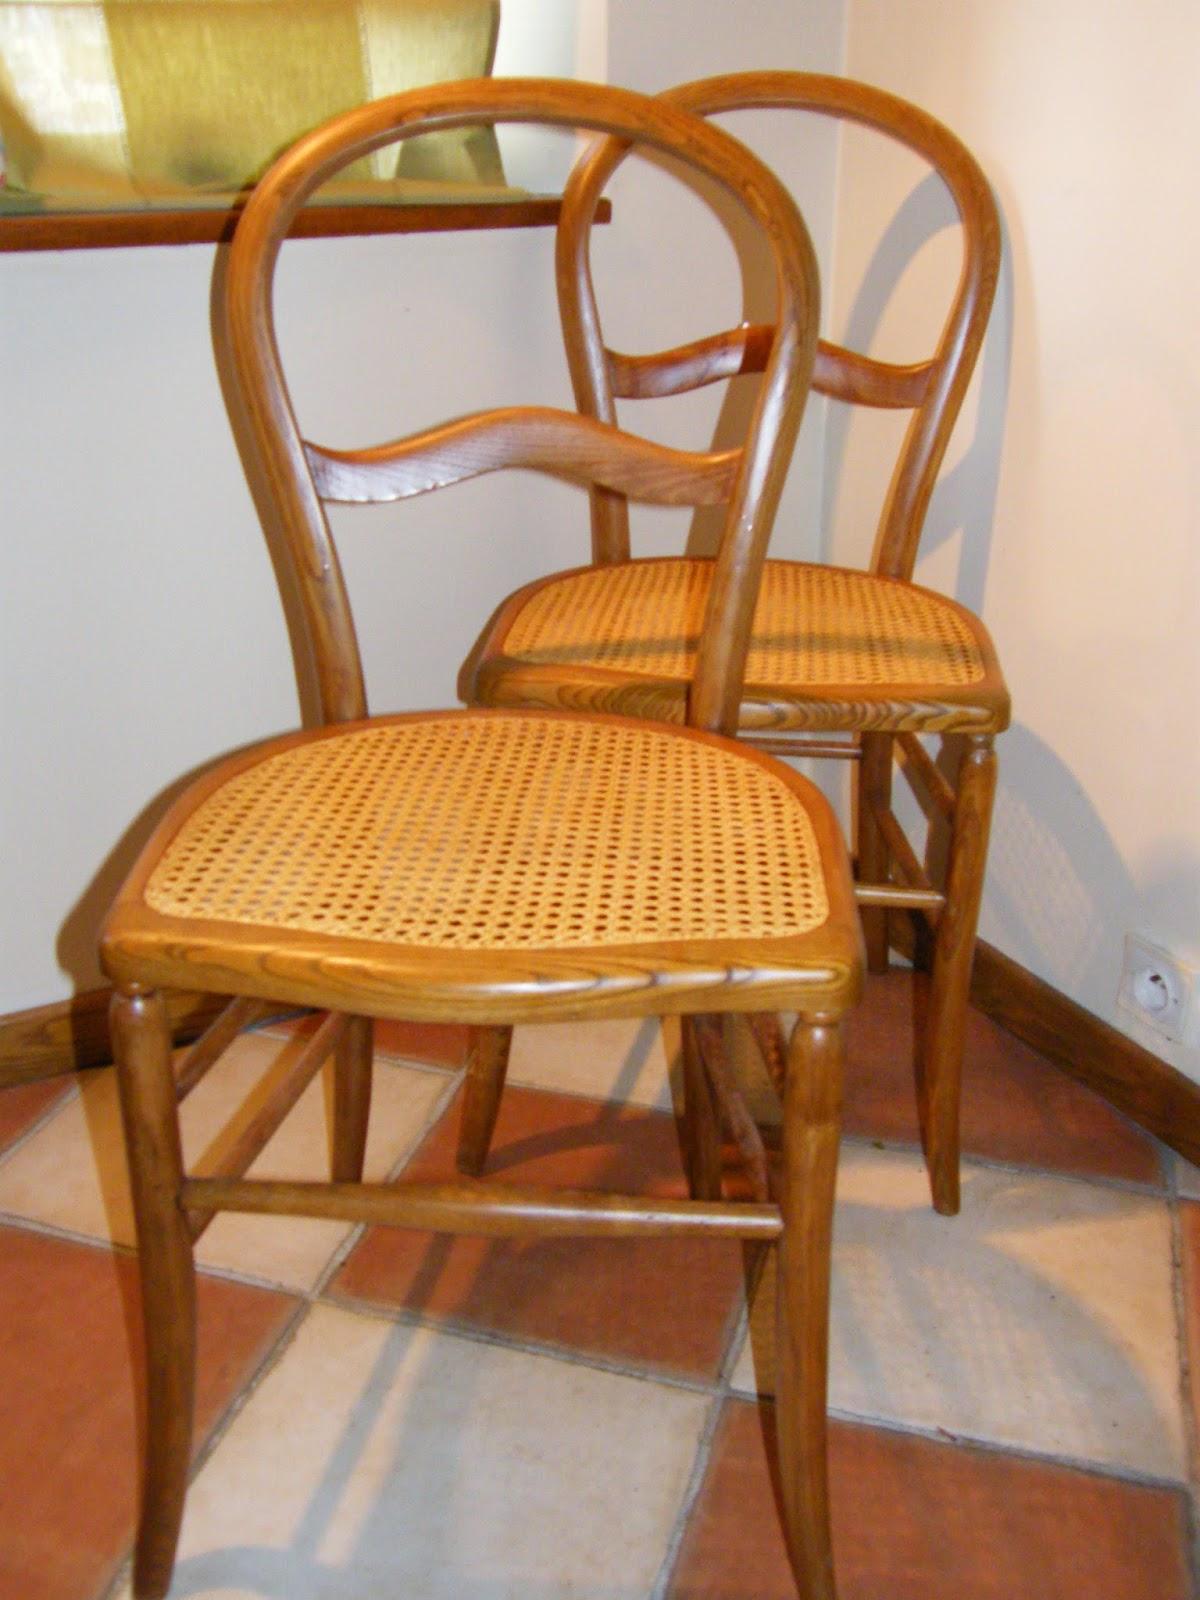 normandie cannage les chaise style louis philippe en. Black Bedroom Furniture Sets. Home Design Ideas